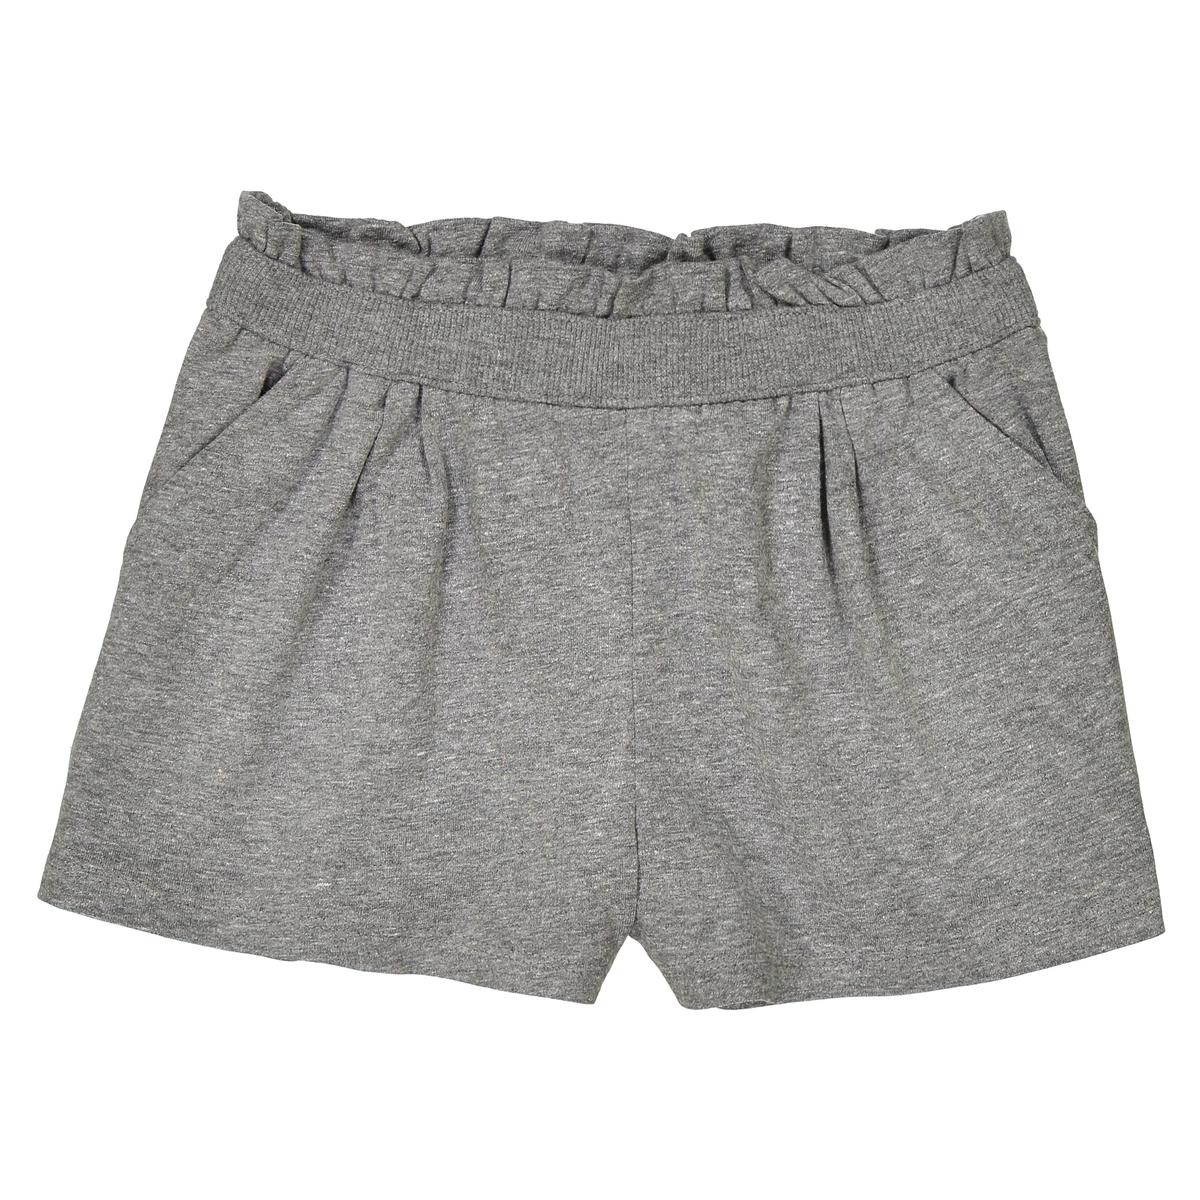 Shorts cintura elasticizzata 3 - 12 anni